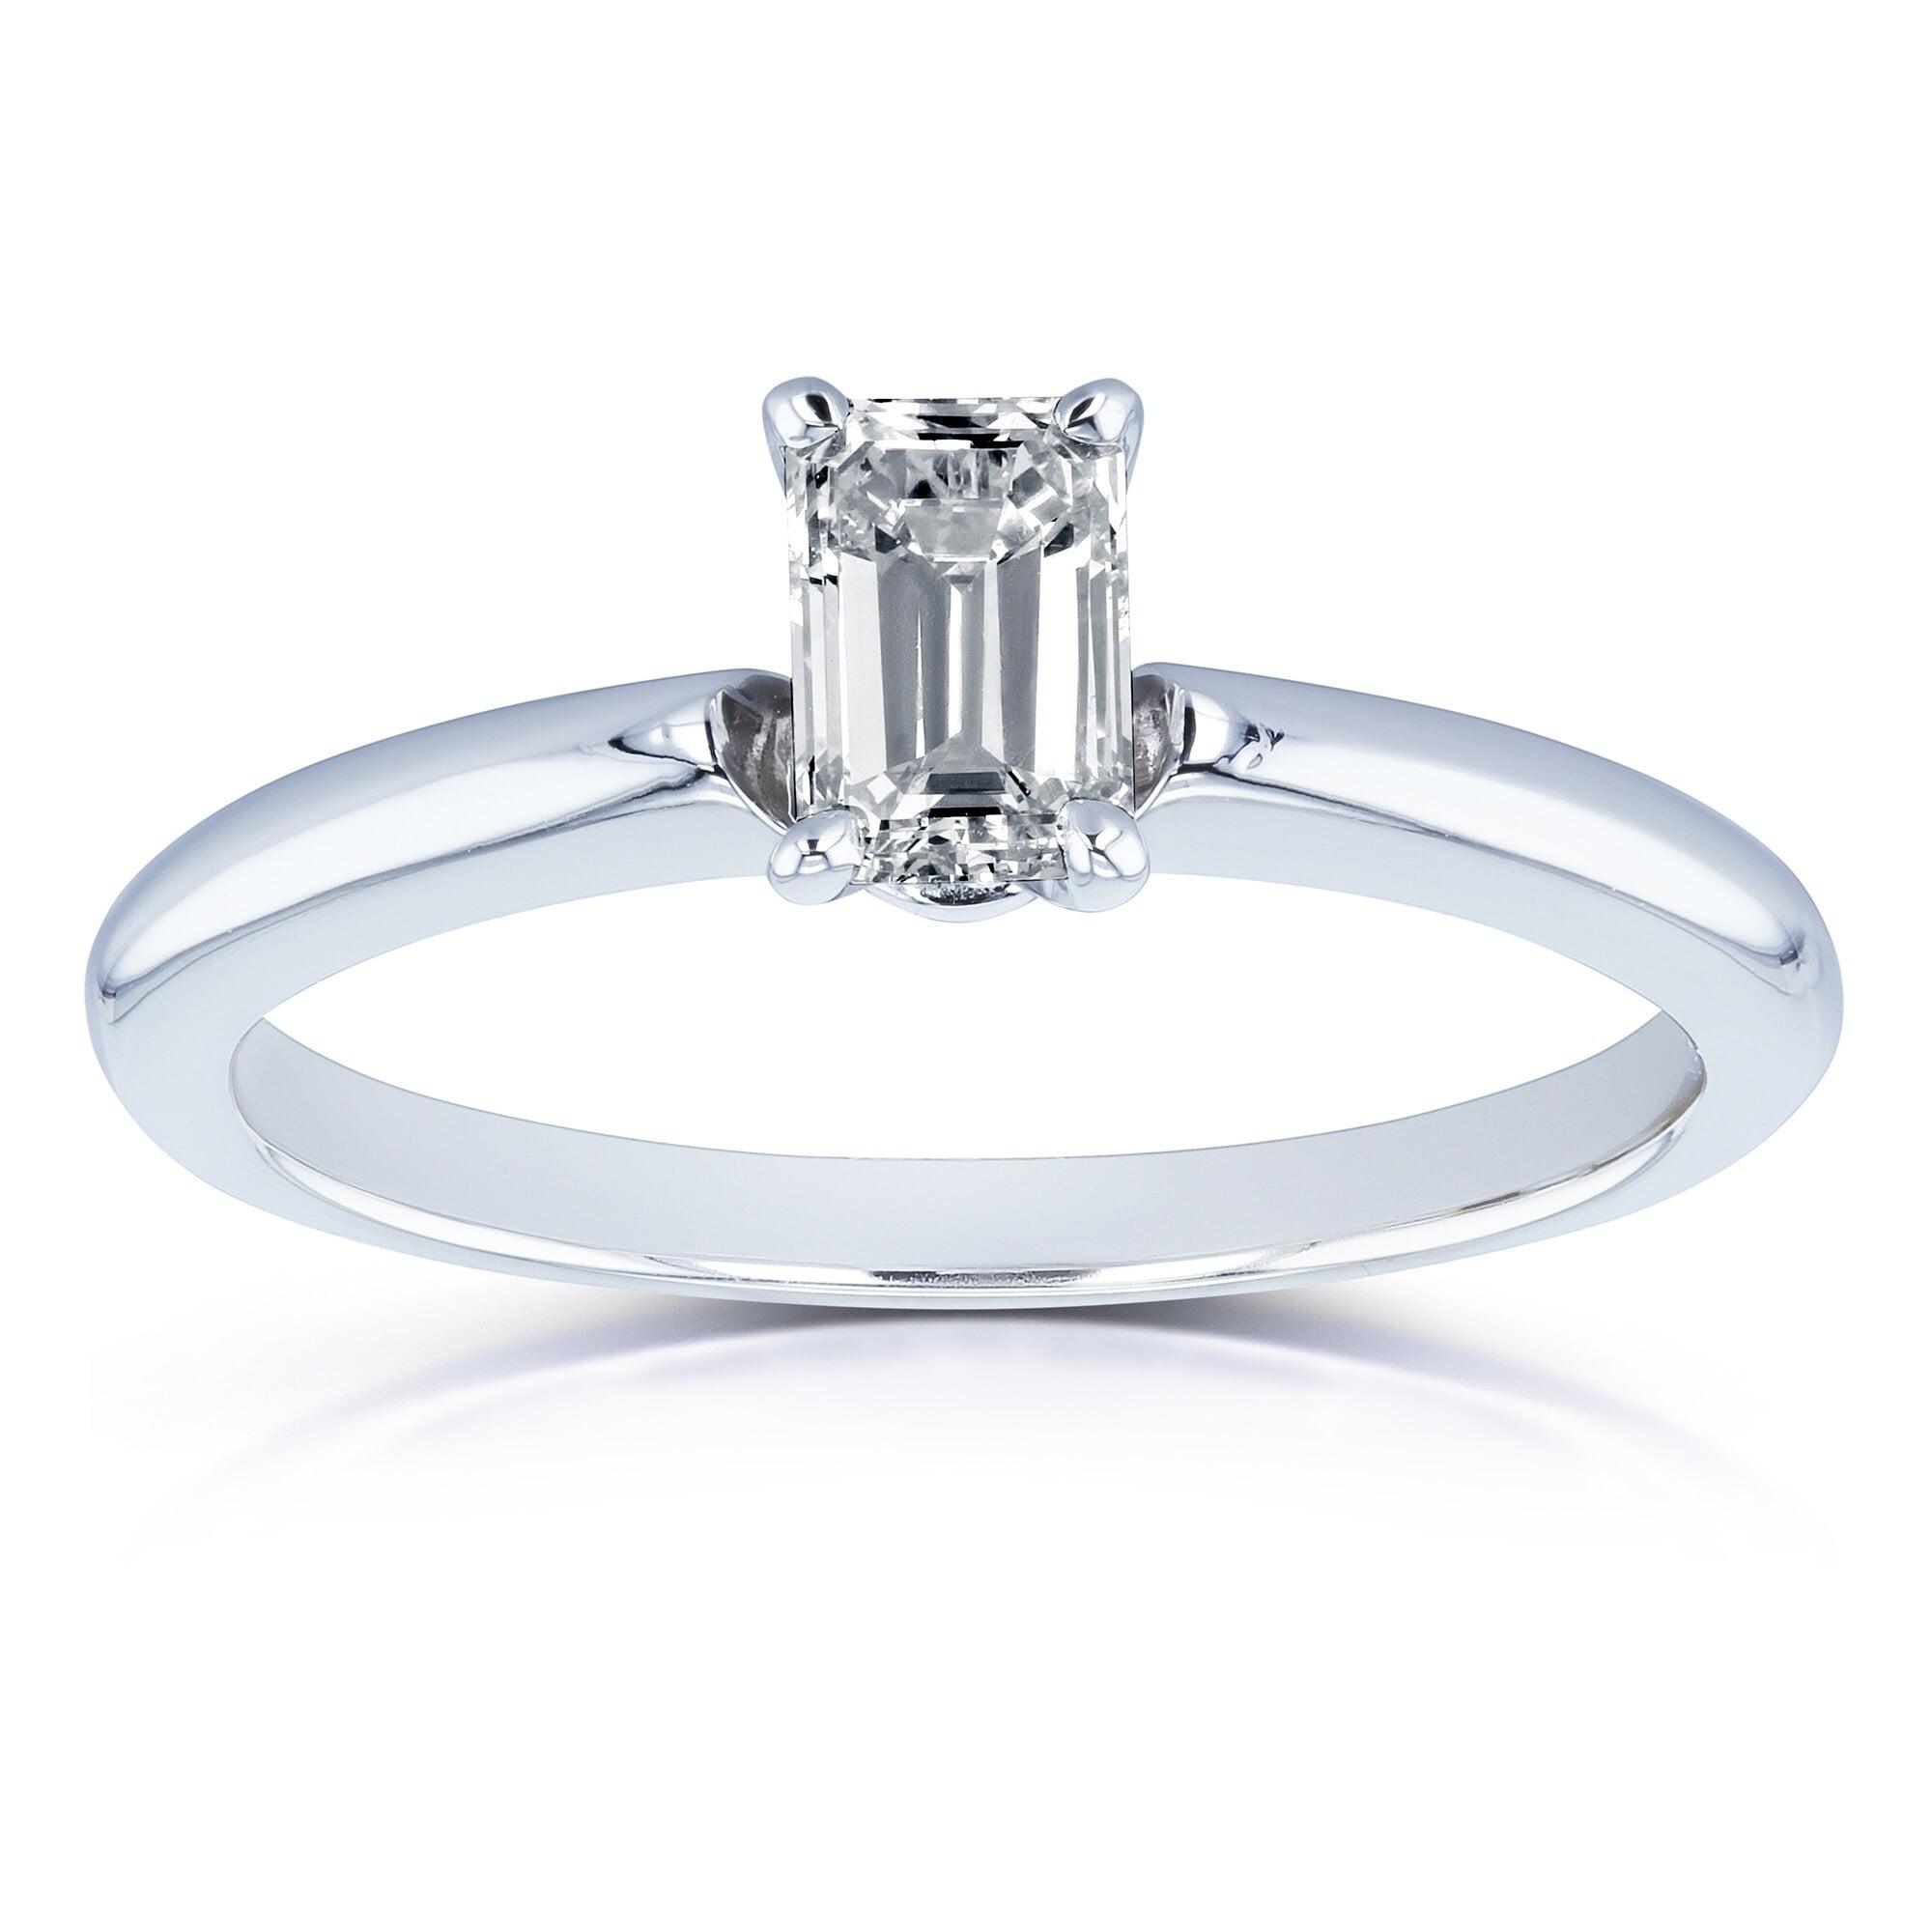 Annello 14k White Gold 1 2 Carat Diamond Solitaire Emerald Cut Engagement Ring Walmart Com Walmart Com